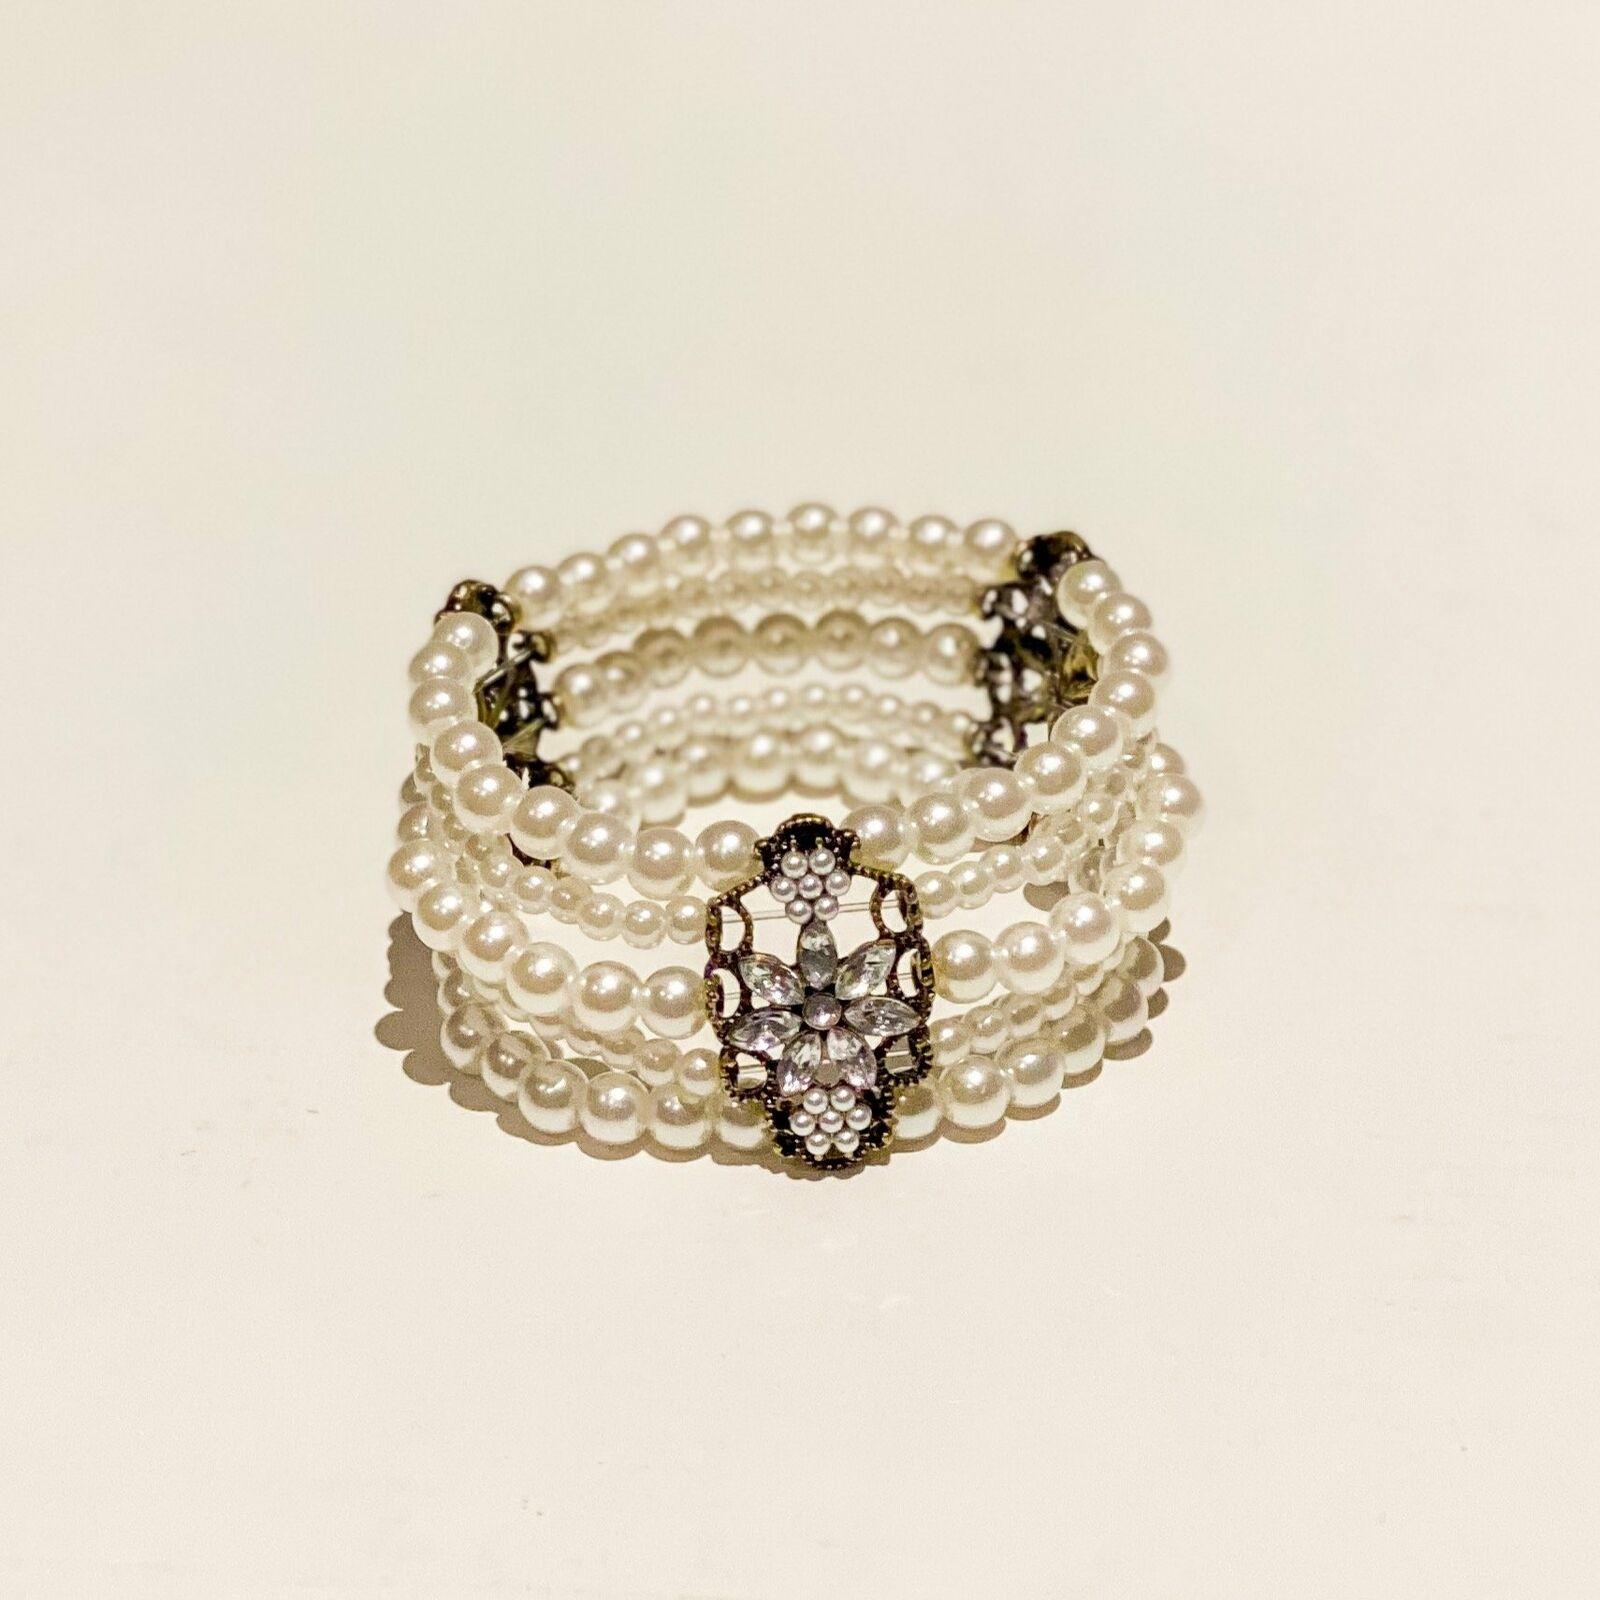 Breakfast at Tiffany's Bracelet